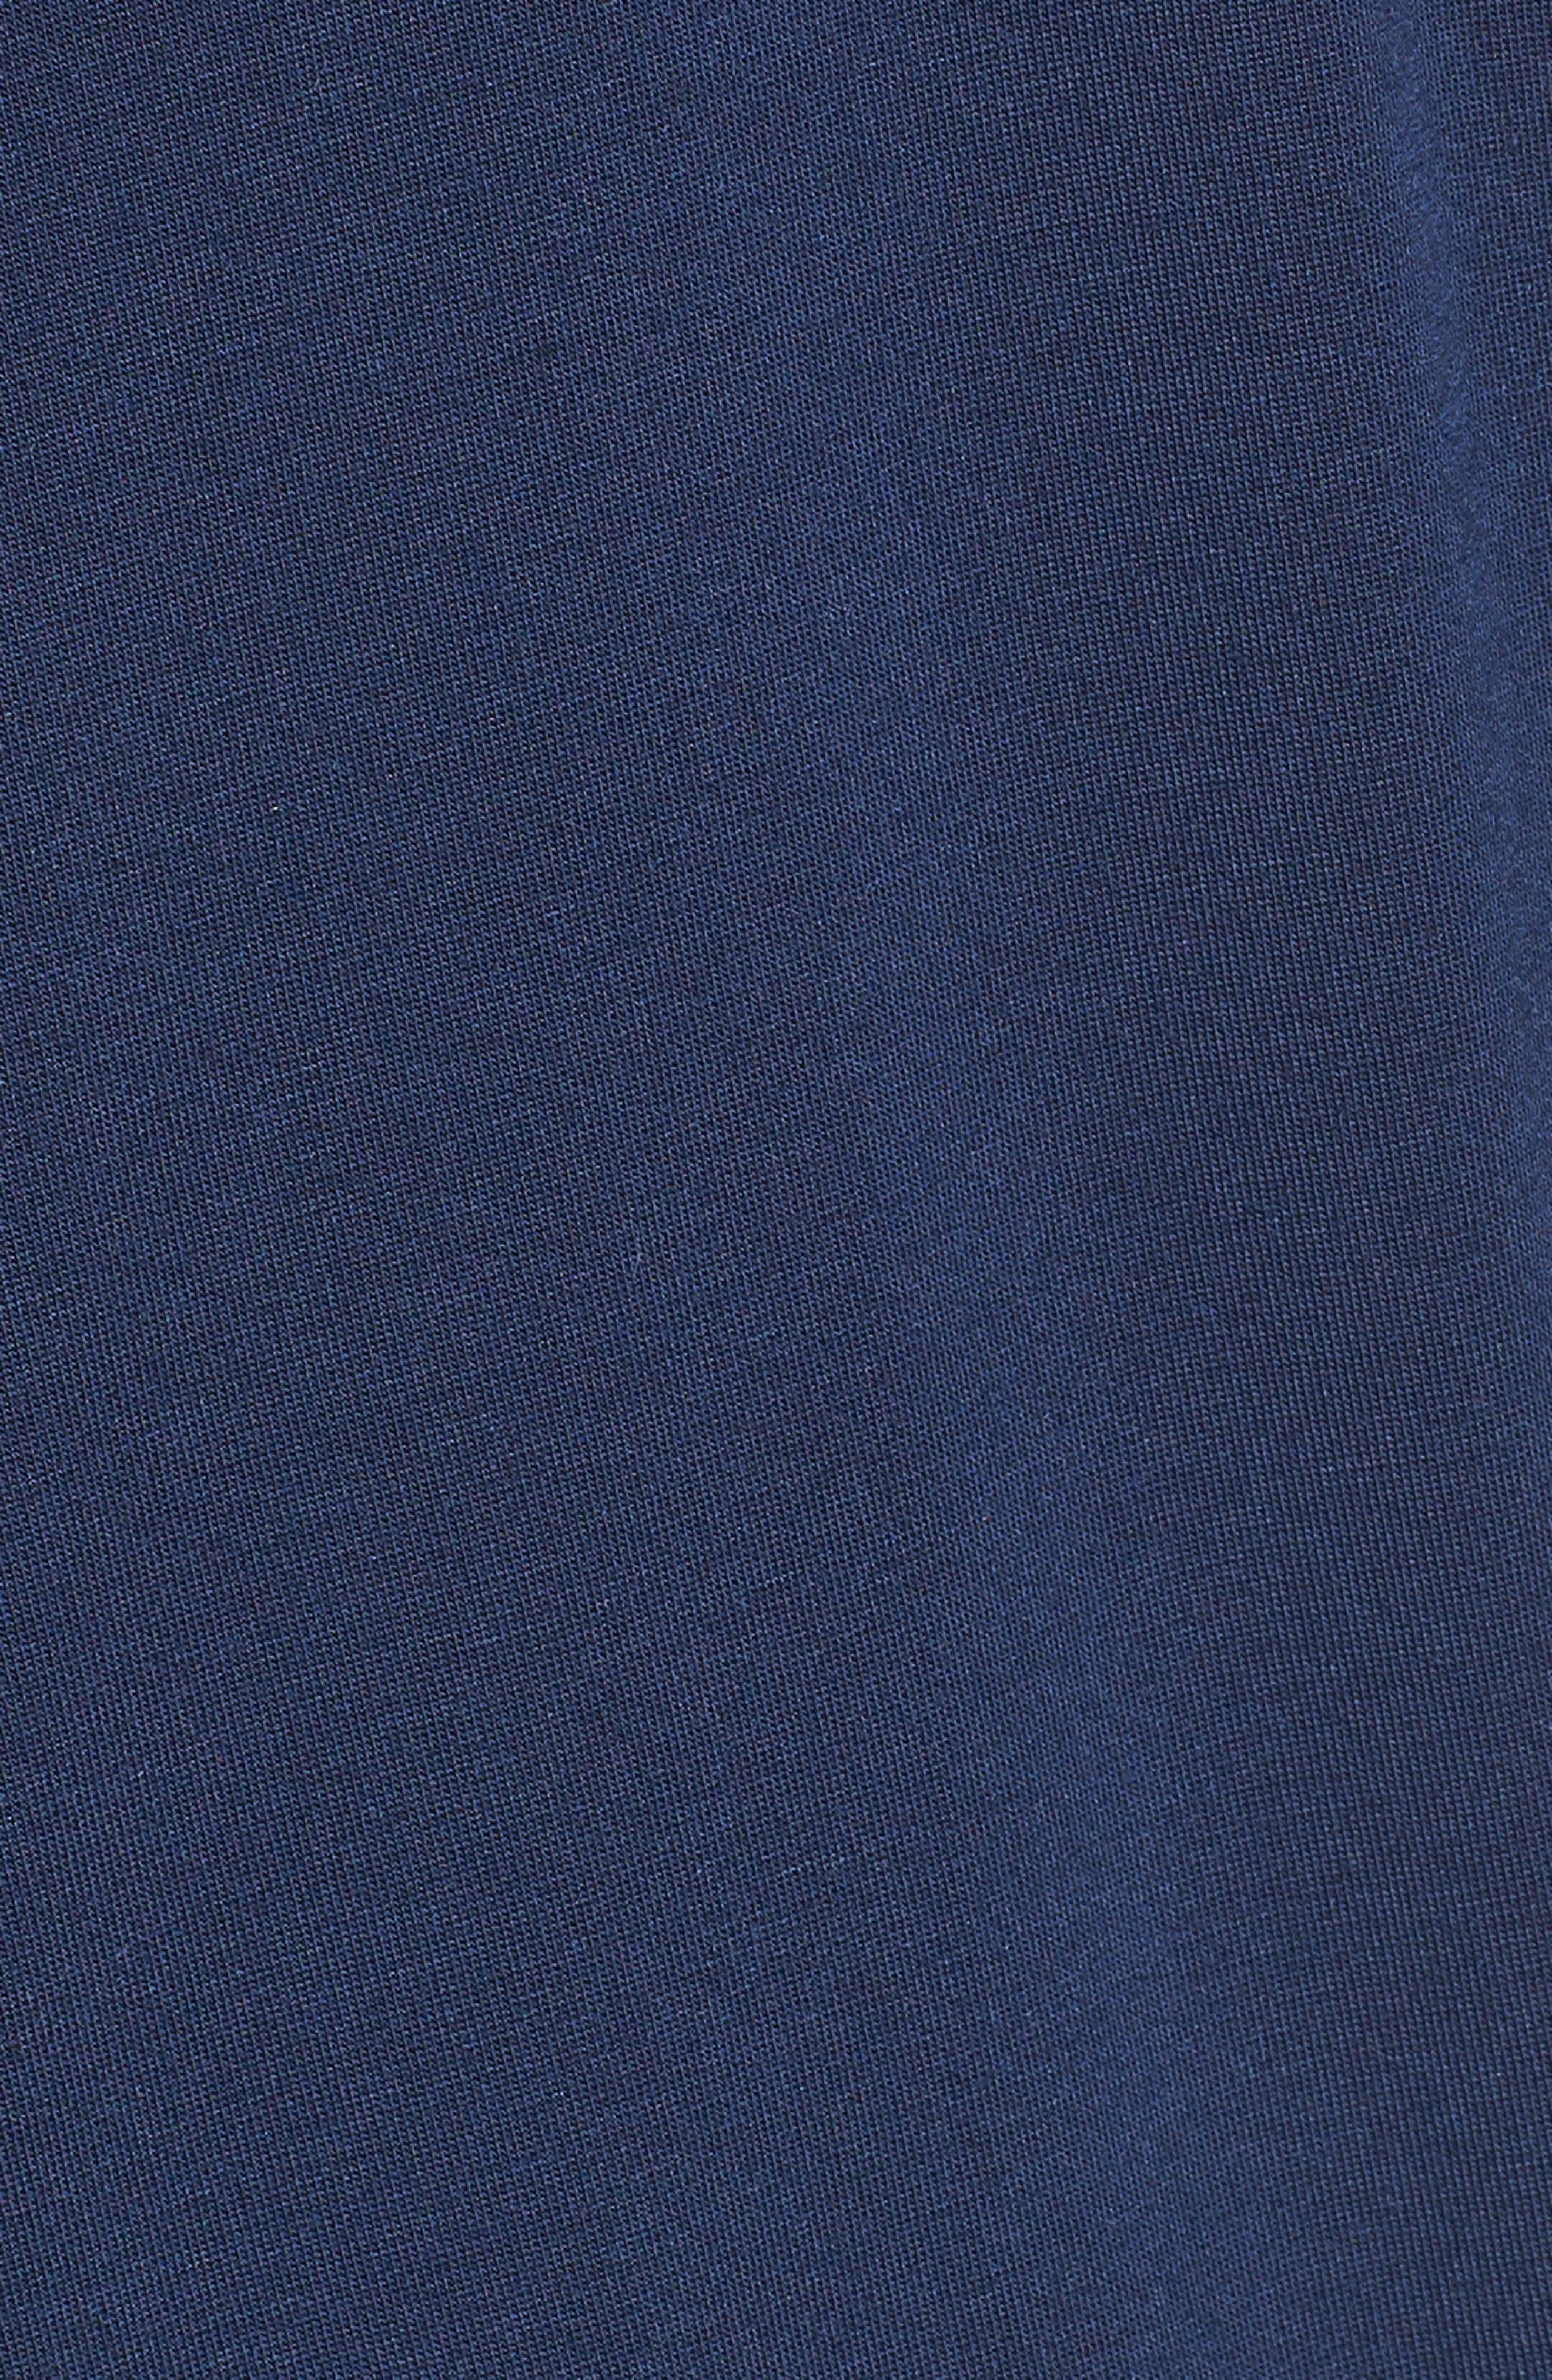 Michaela Stretch Modal Cardigan,                             Alternate thumbnail 5, color,                             NAVY